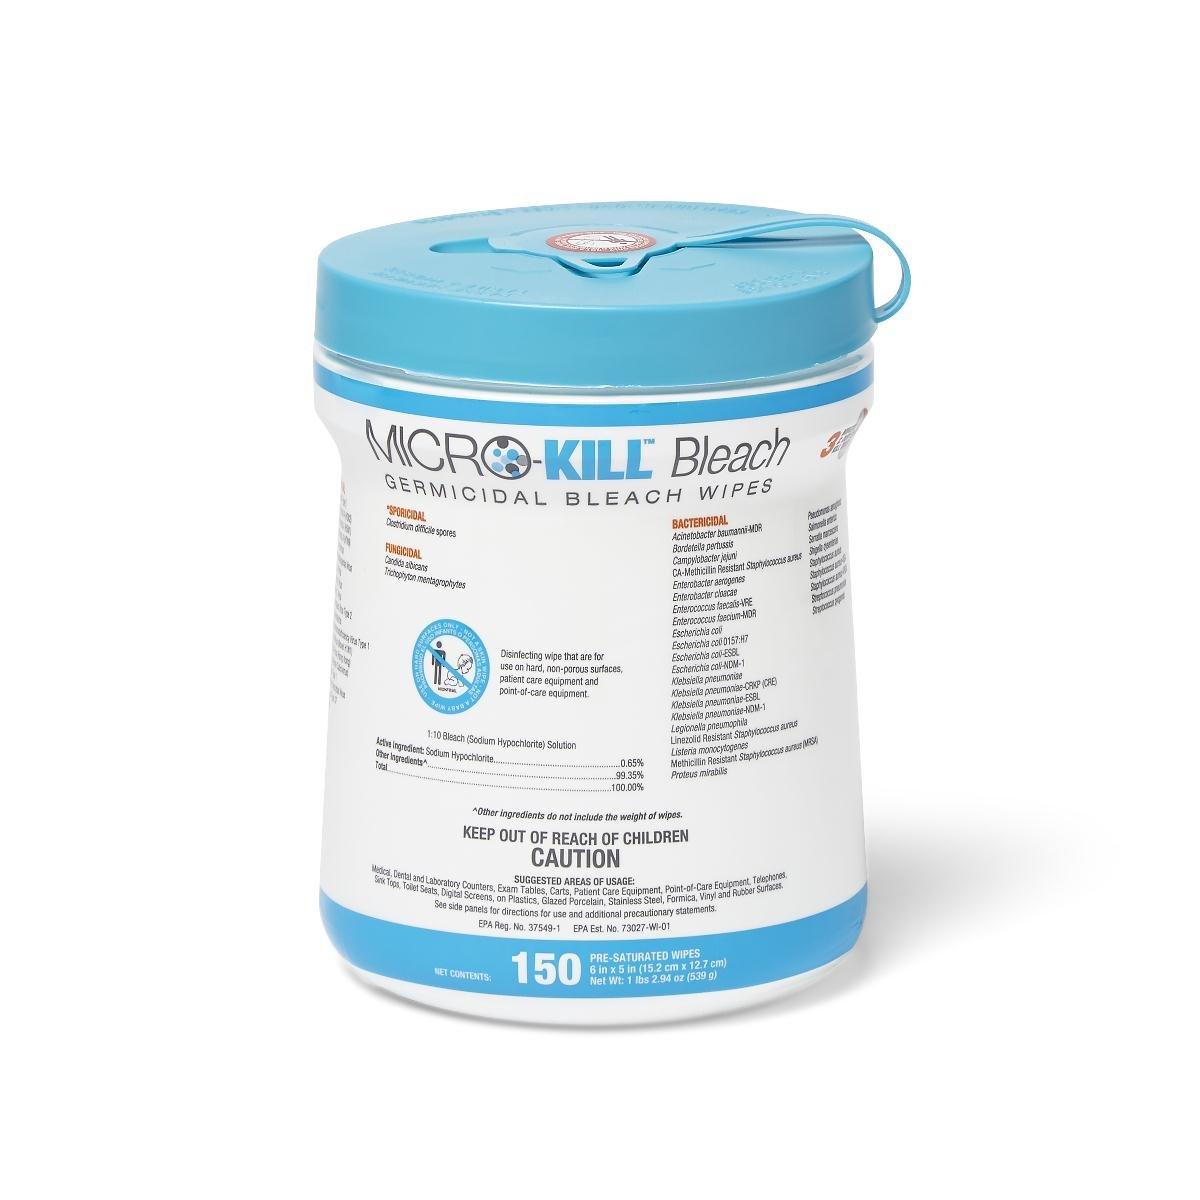 Medline MSC351410AN1 Micro-Kill Bleach Germicidal Bleach Wipes, 6'' x 5'', 150/Canister